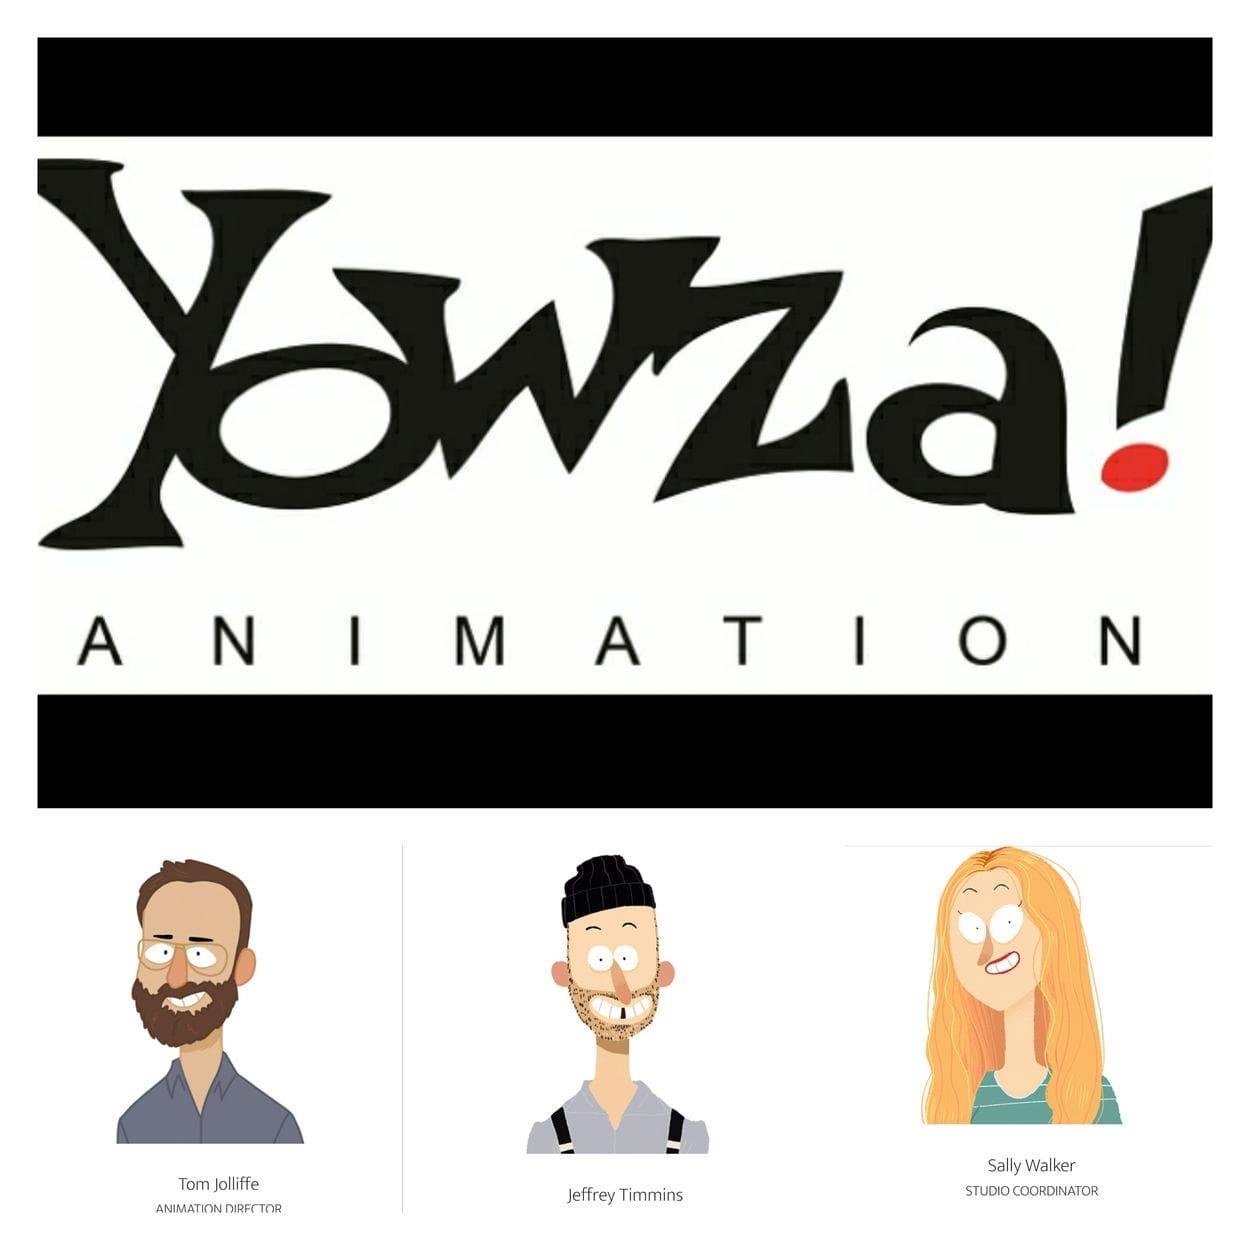 Yowza! Animation visit Feb 22/19